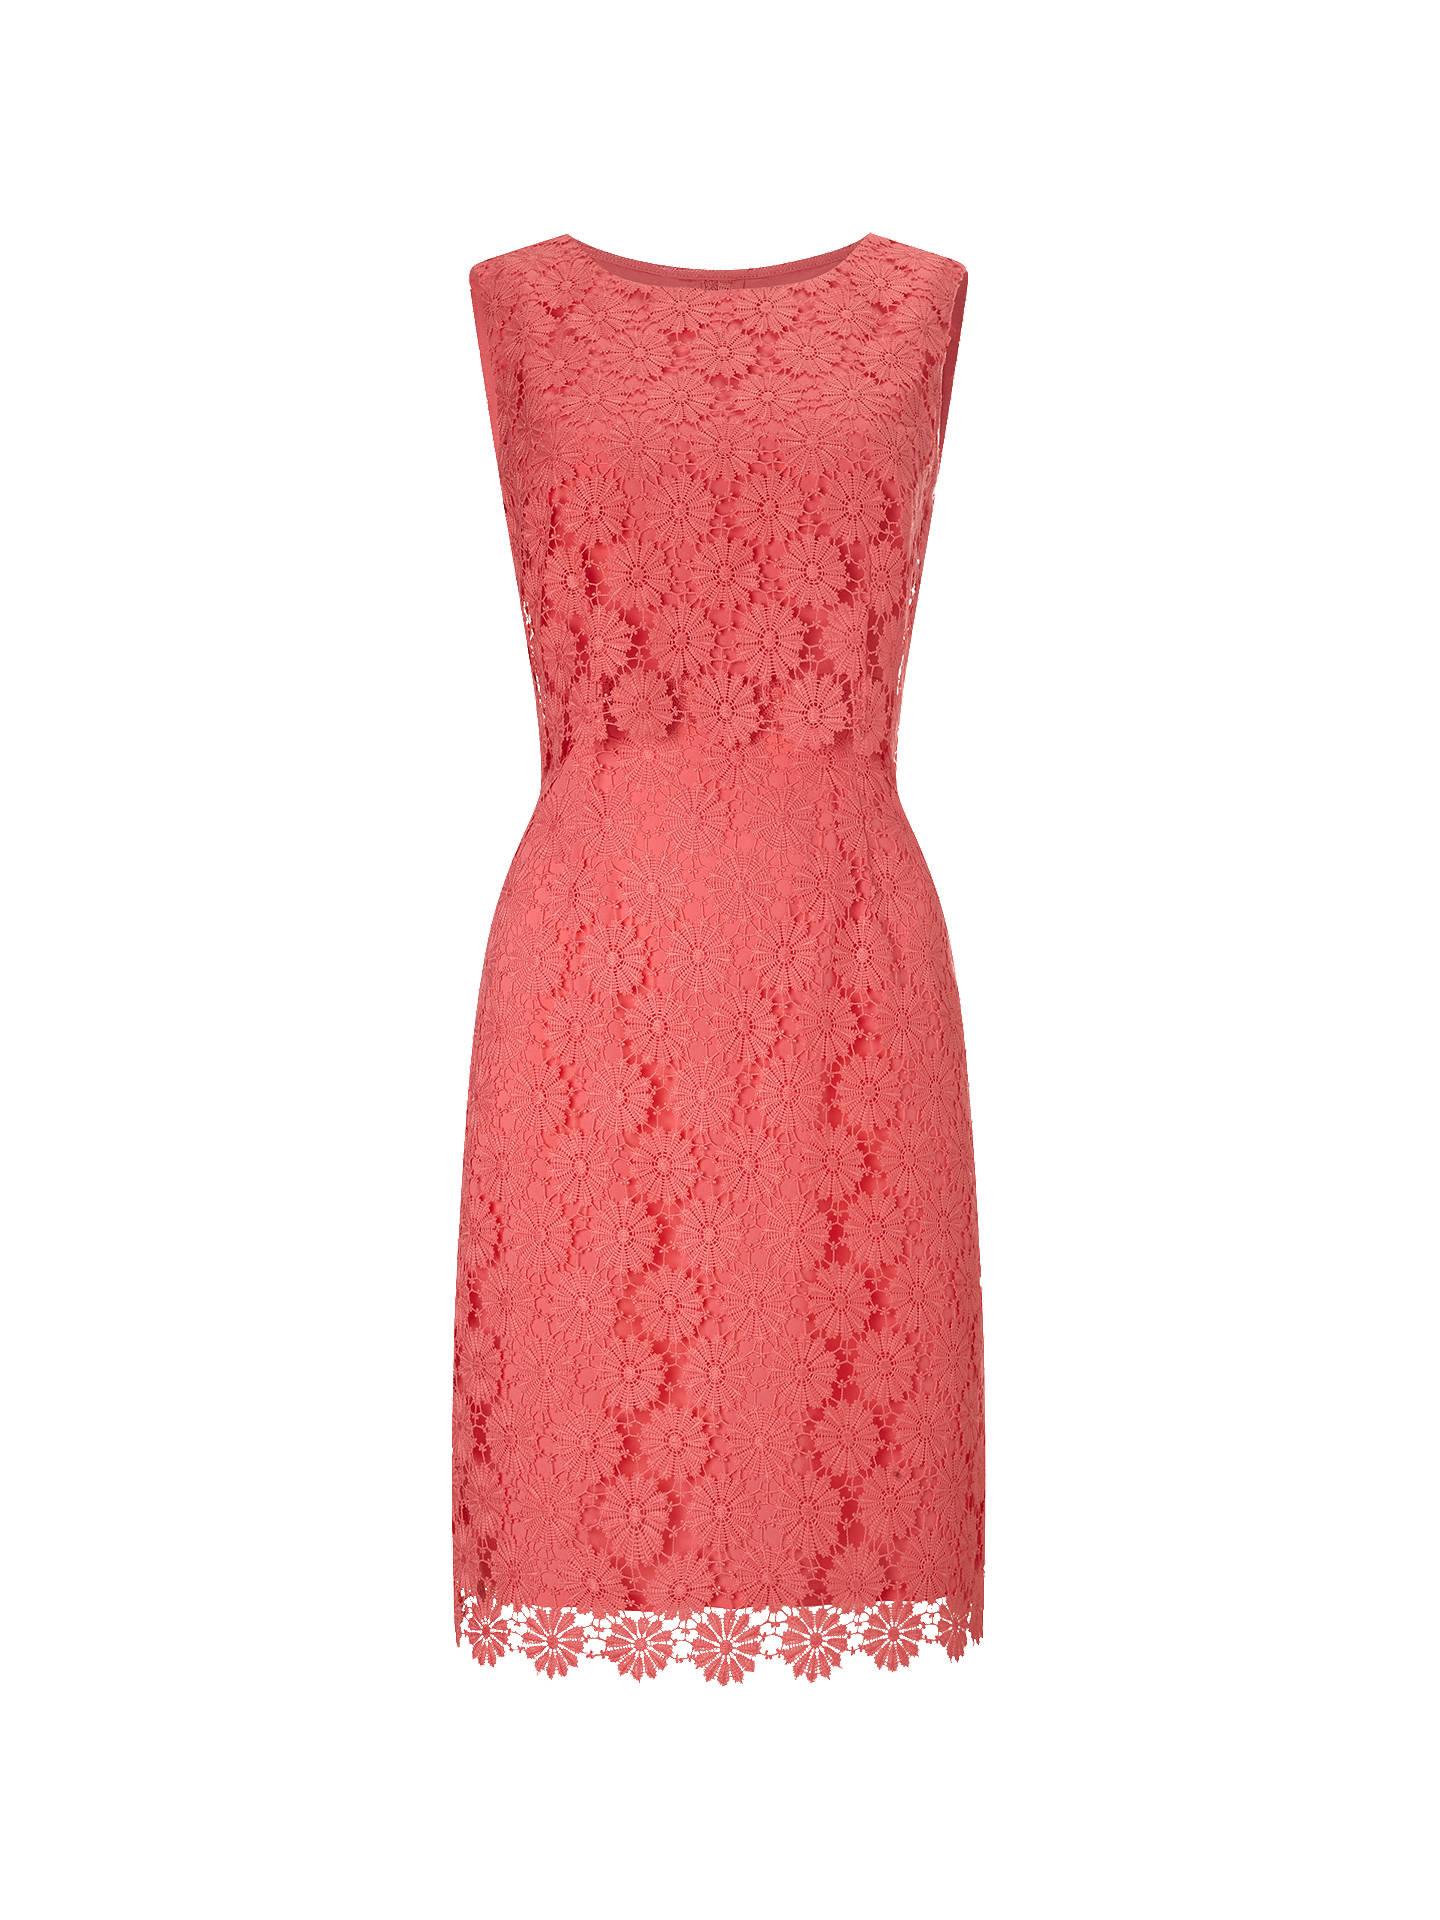 c925c24719 Buy Precis Petite by Jeff Banks Lace Shift Dress